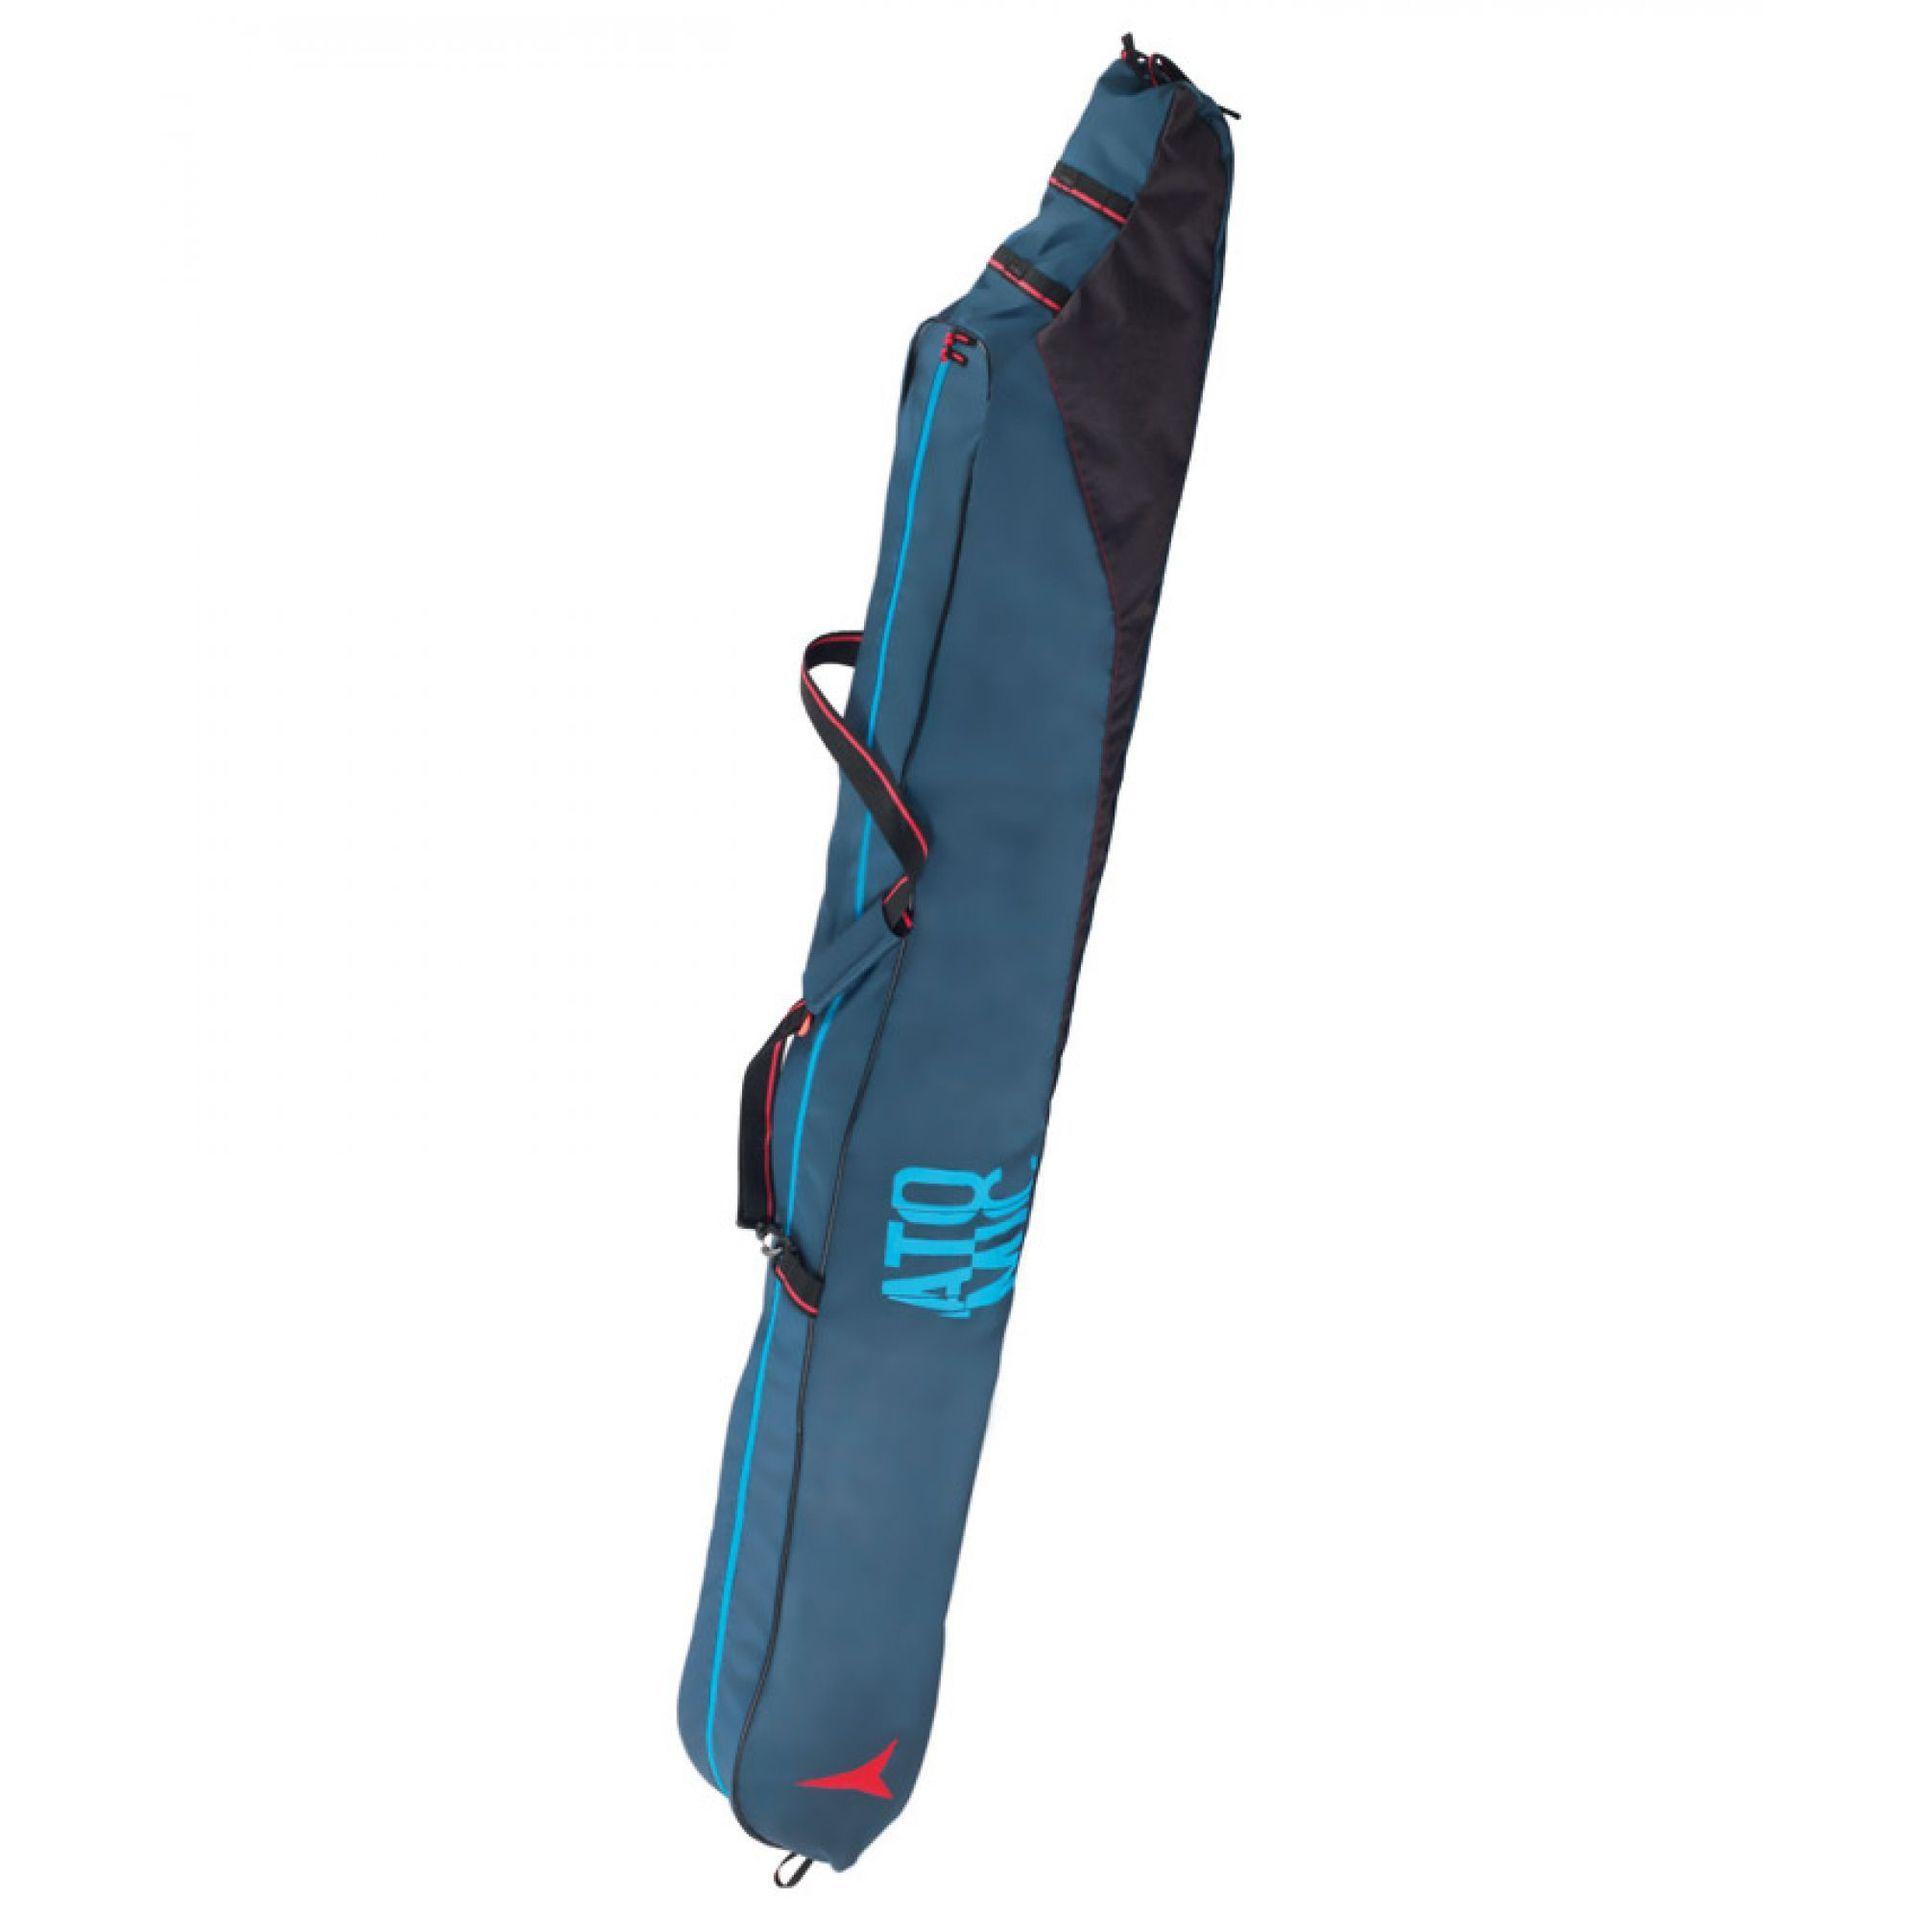 Atomic Double Ski Bag Padded - The Best Blazer And Bag Woman 5b2e2029117c0